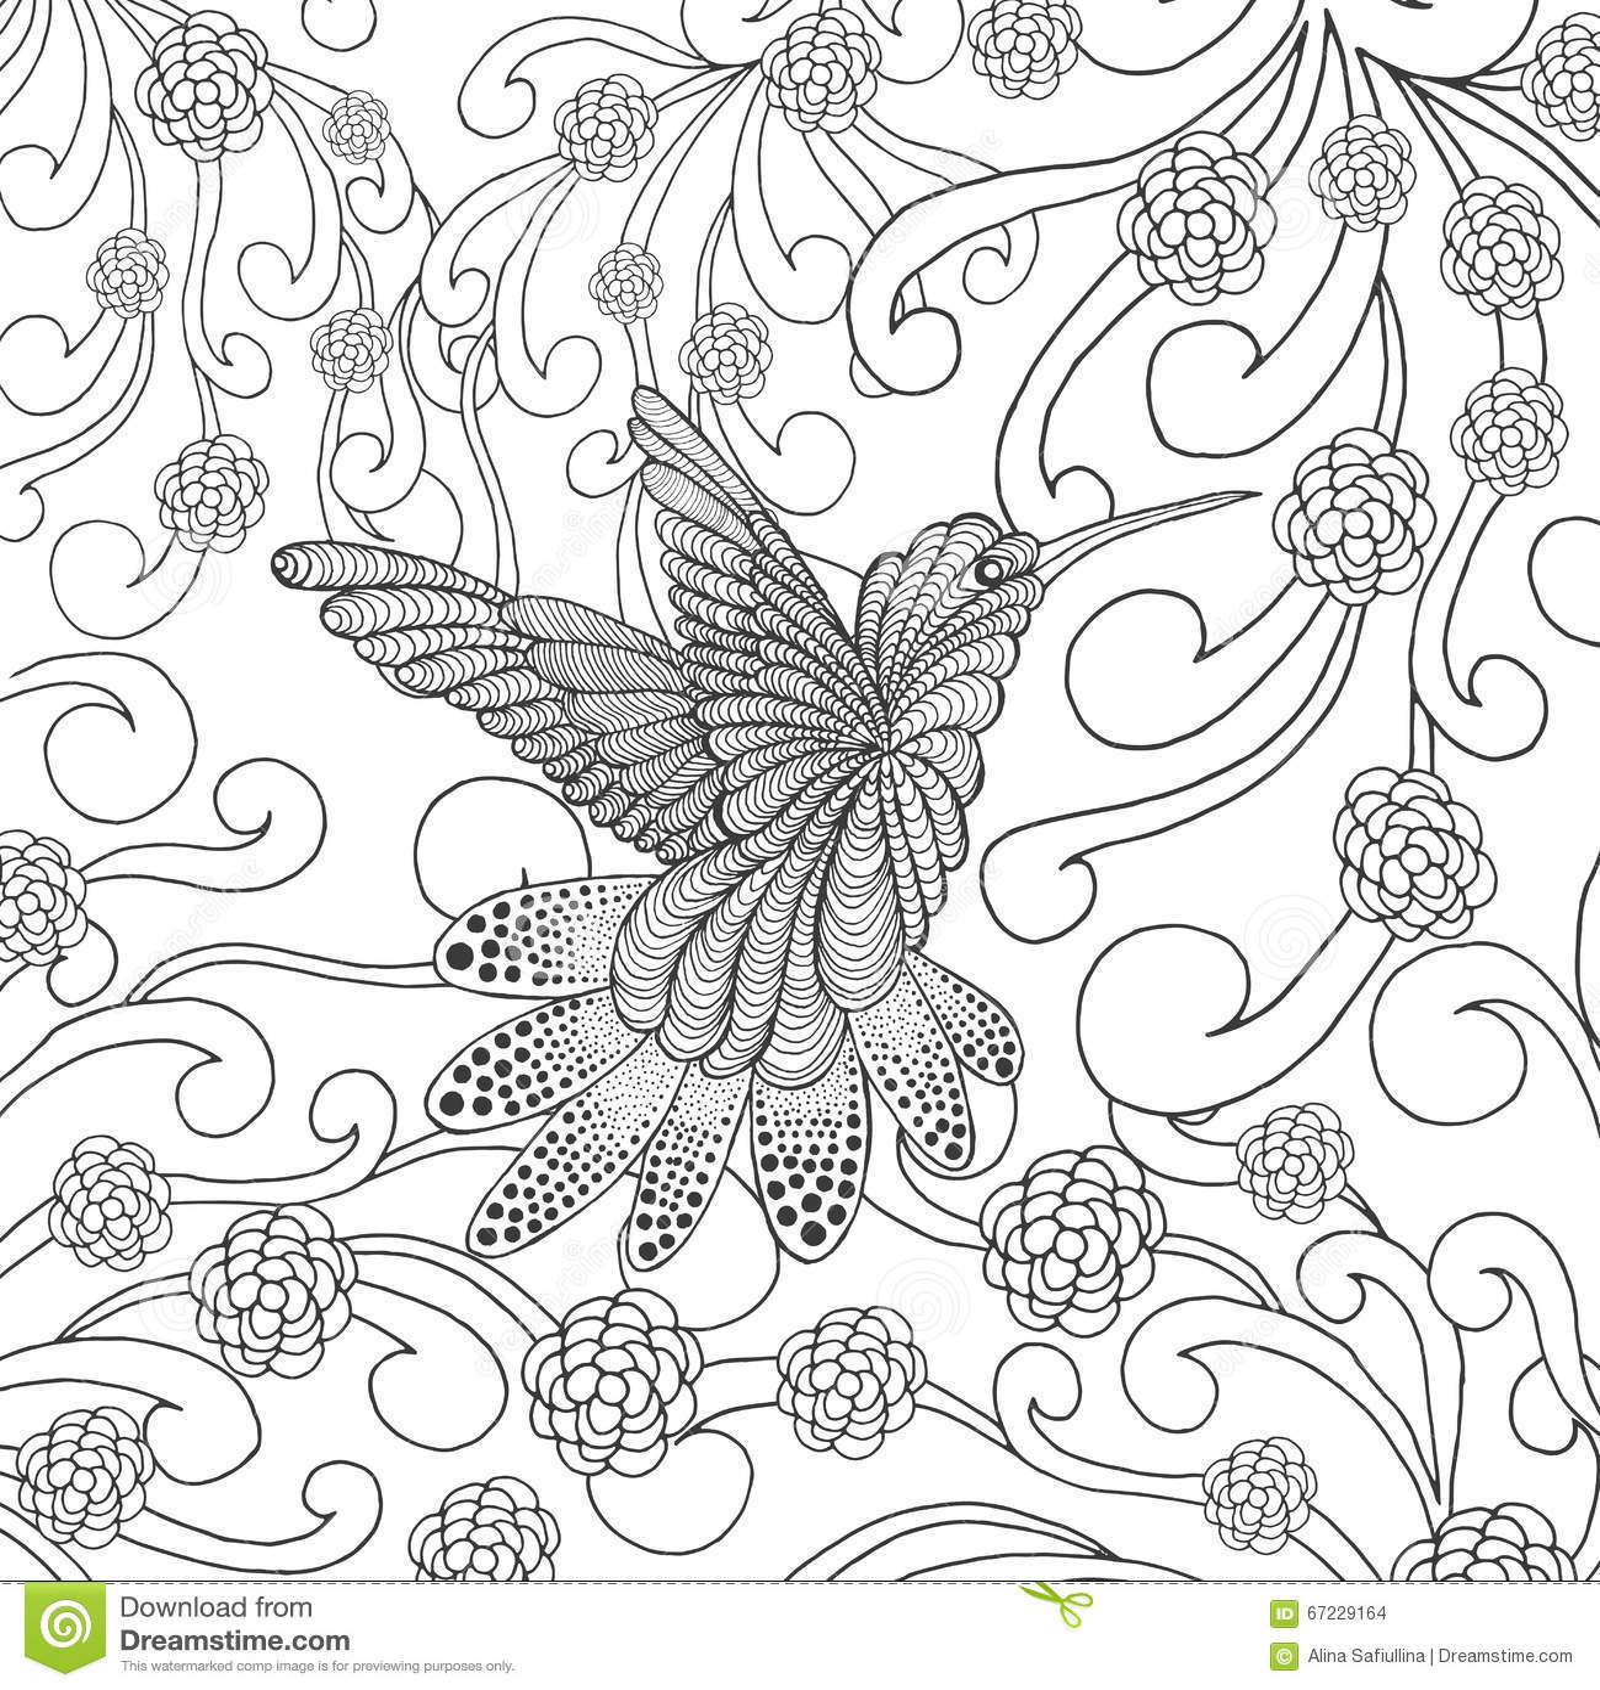 Hummingbird Garden Design Scented Garden And Hummingbird Painted